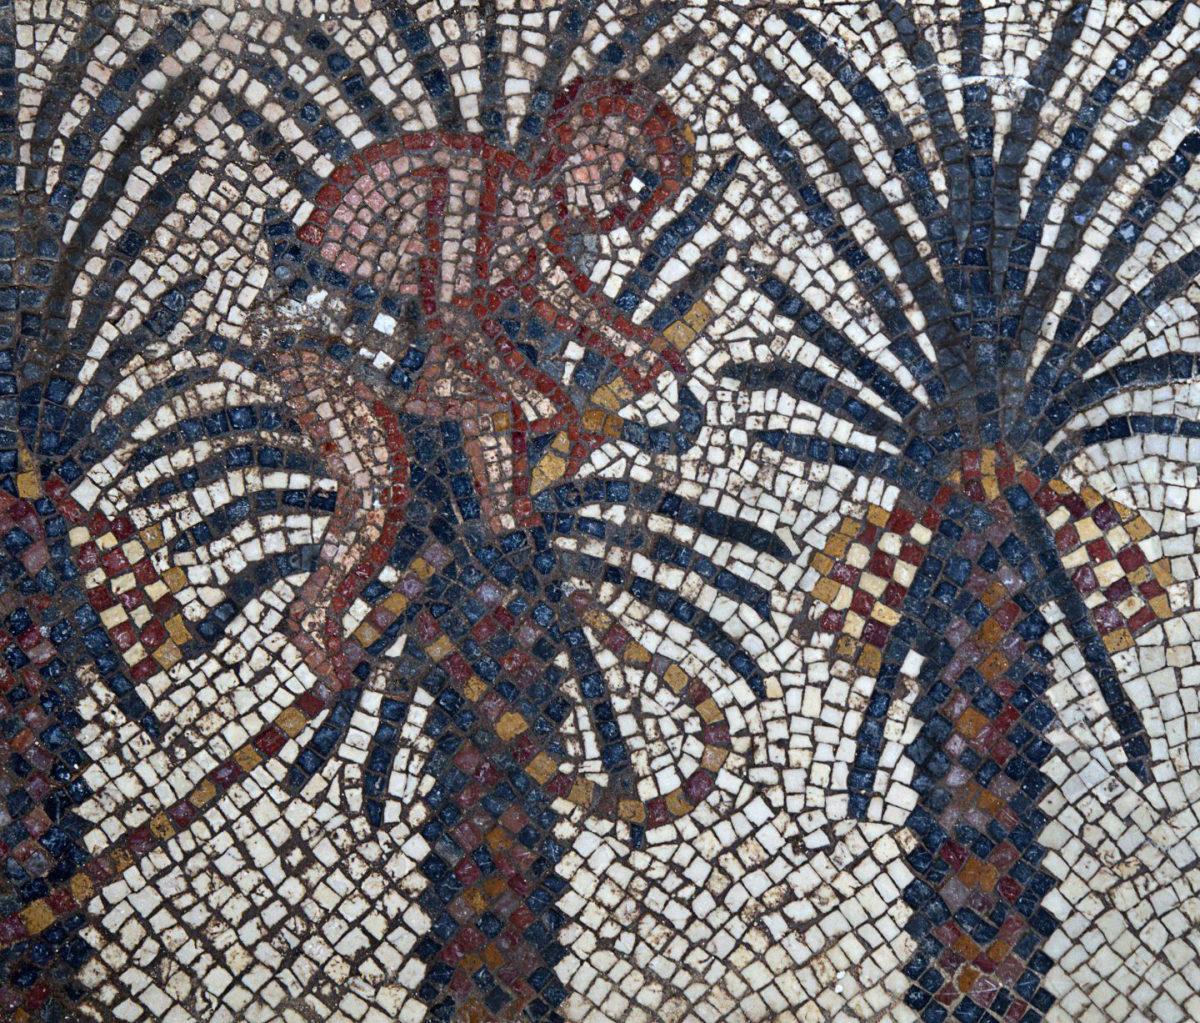 Elim mosaic detail, Huqoq Excavation Project. Copyright Jim Haberman. All rights reserved. Courtesy: UNC-Chapel Hill. Credit: Copyright Jim Haberman